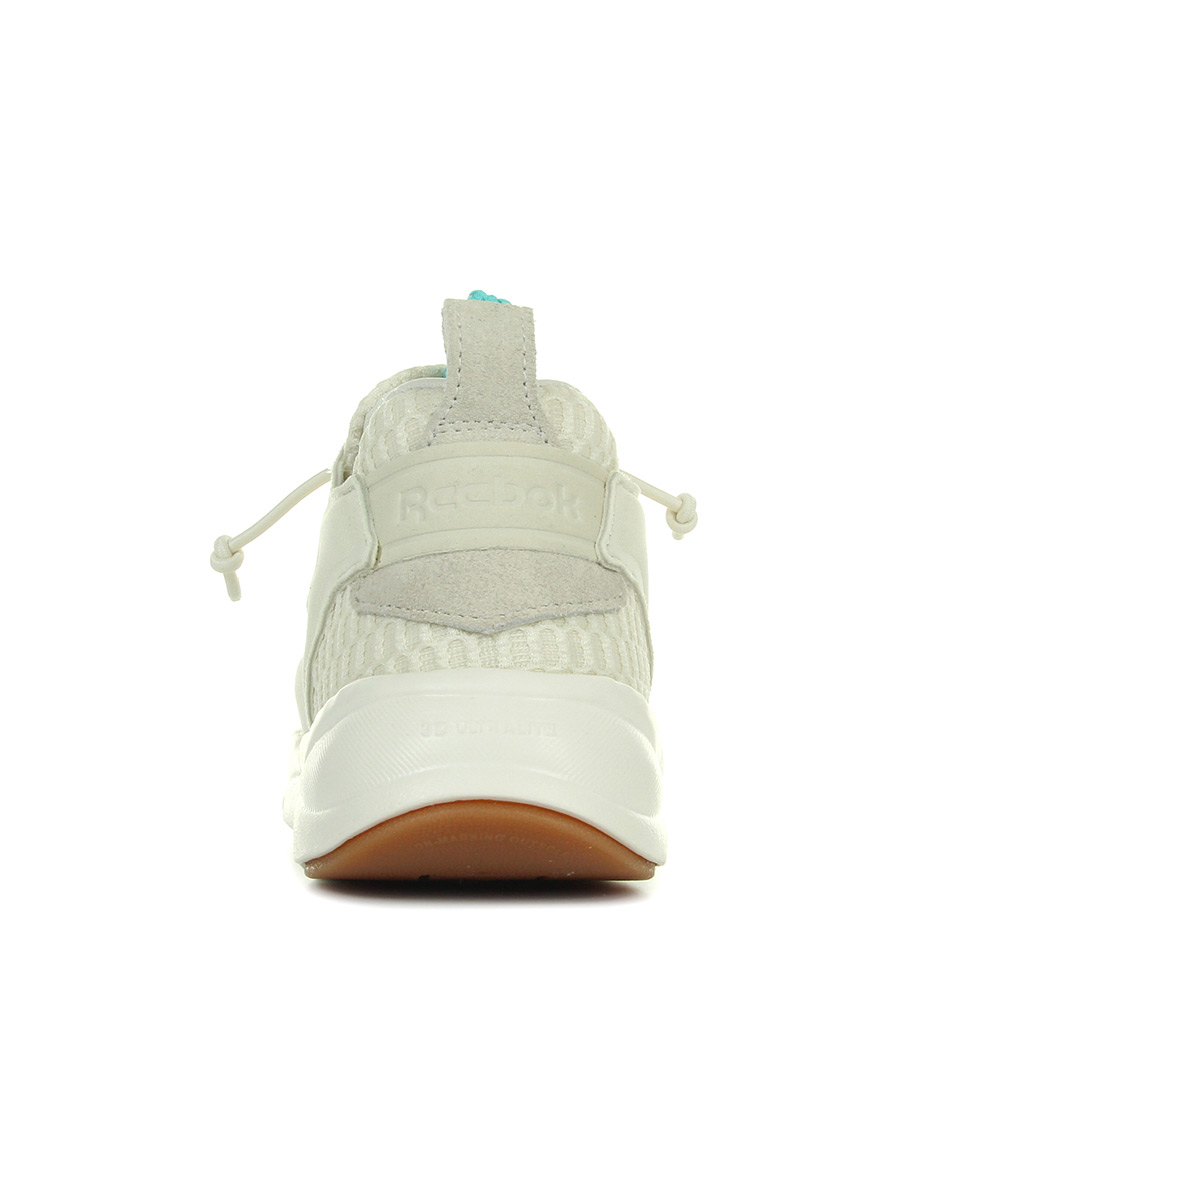 1890a6febab Chaussures Baskets Reebok femme Furylite Loom Classic taille Blanc ...